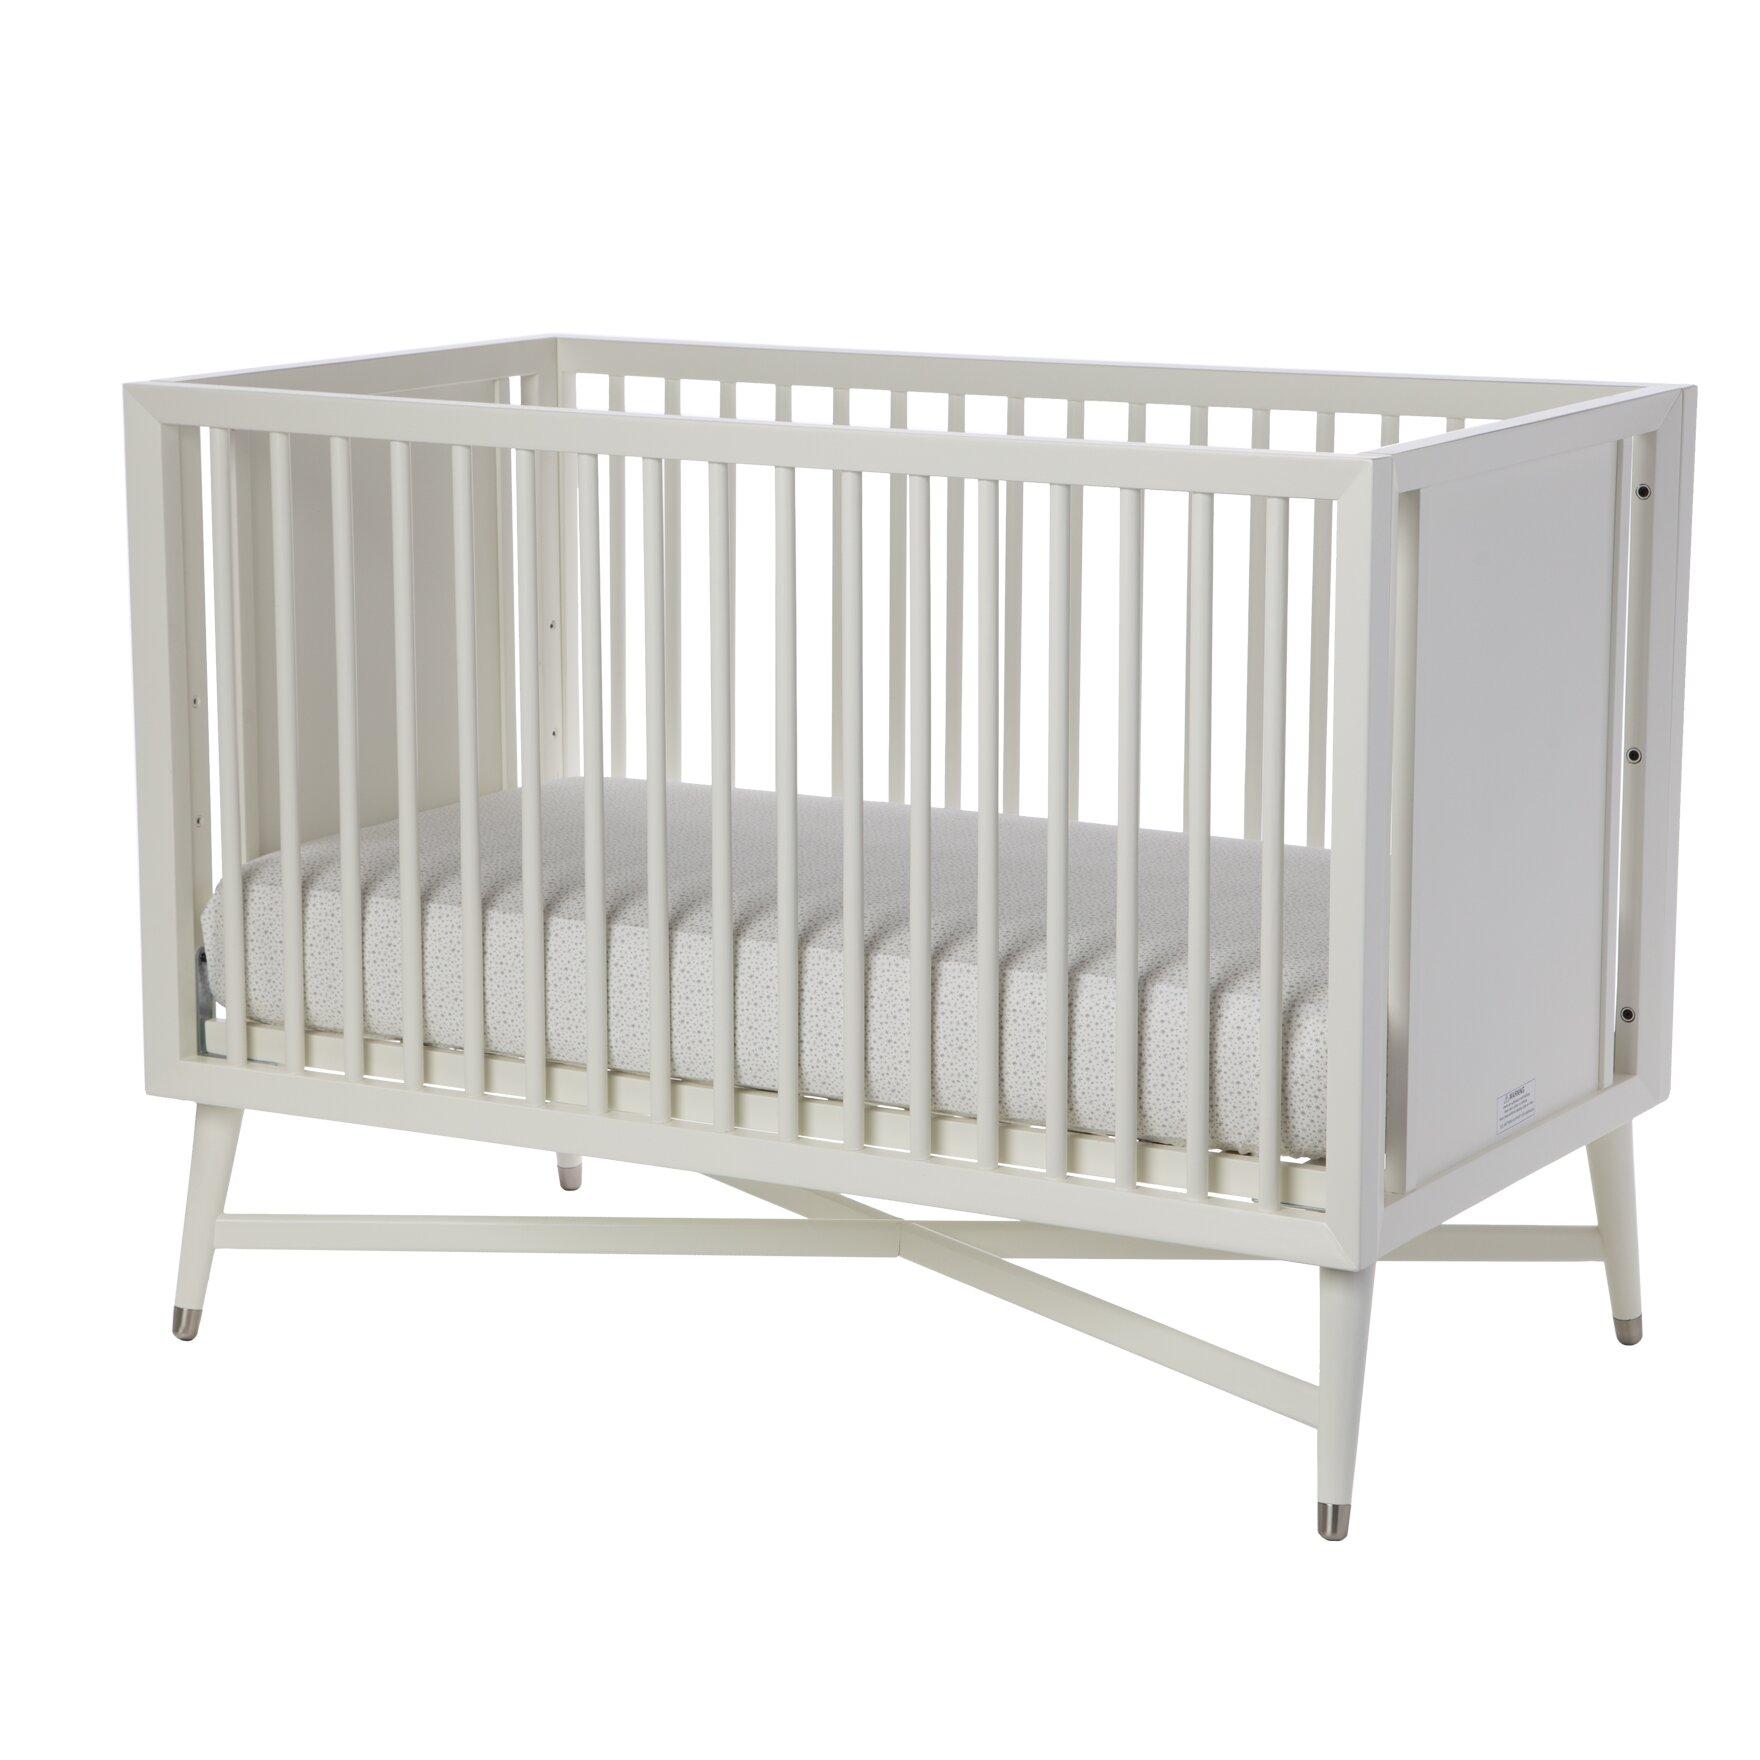 Baby crib for sale tulsa - Dwellstudio Mid Century 3 In 1 Convertible Crib